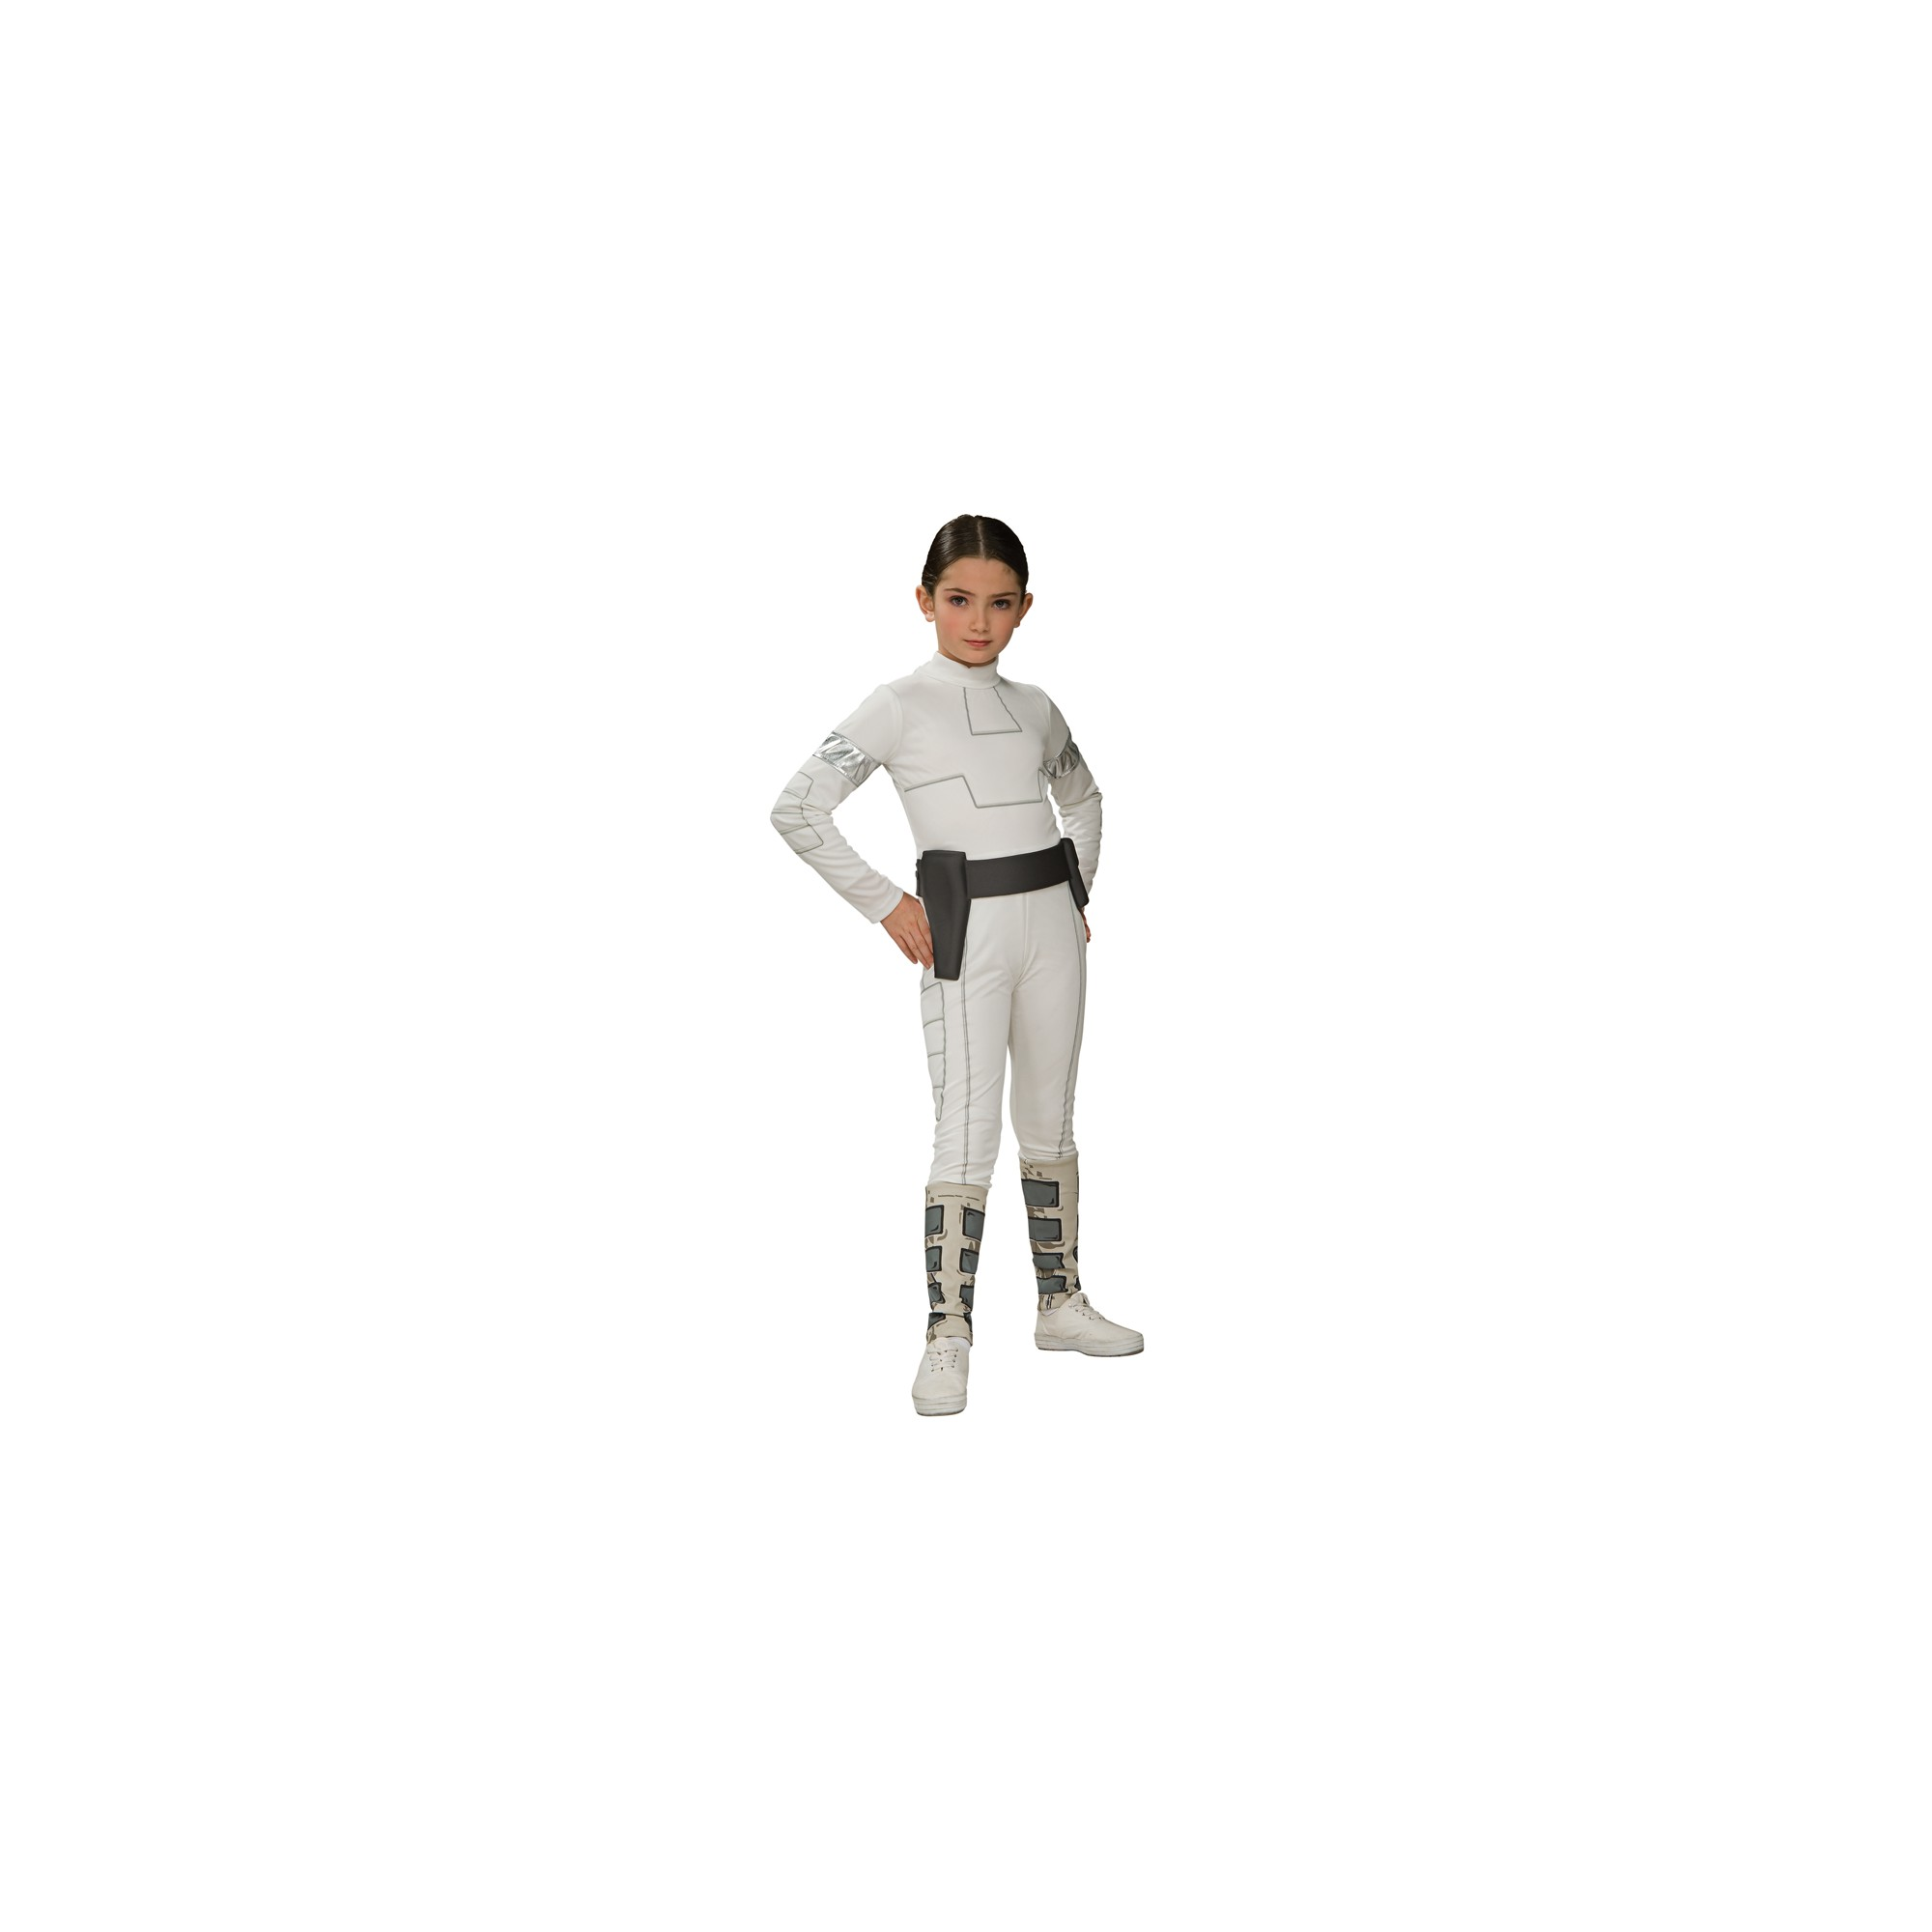 Halloween Star Wars Padme Girls' Amidala Costume Medium (7-8), Girl's, Size: Medium(7-8)